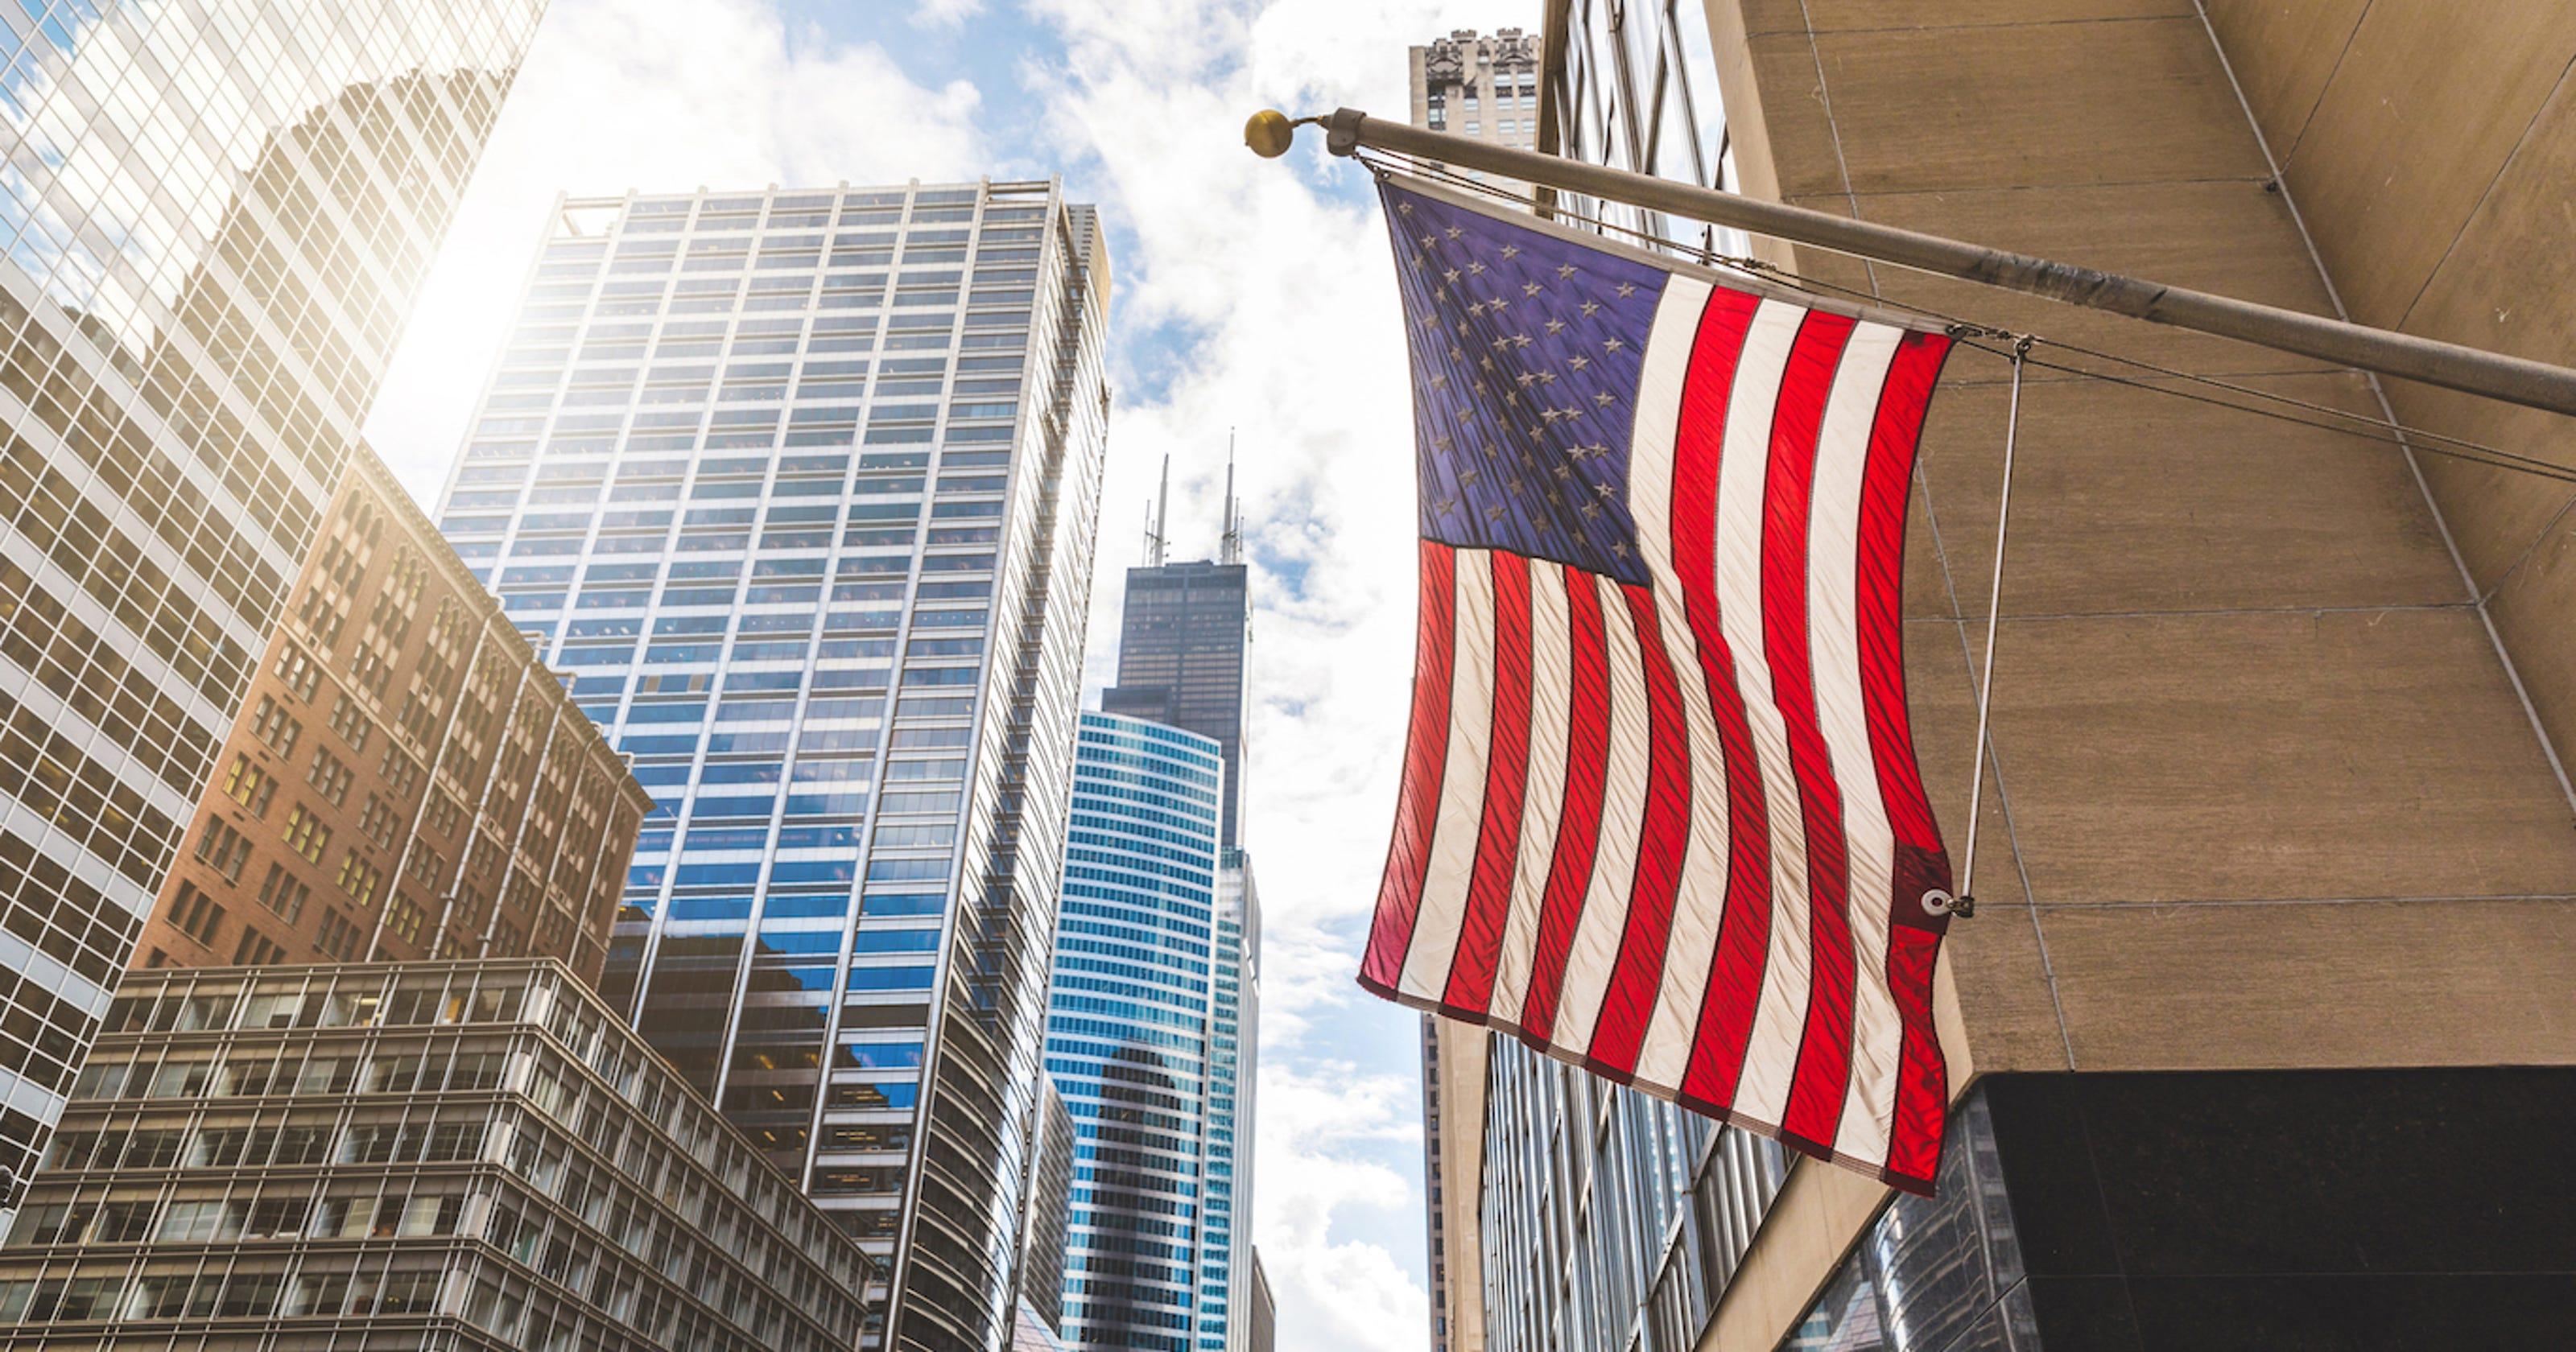 america s most patriotic brands jeep disney coke top the survey list